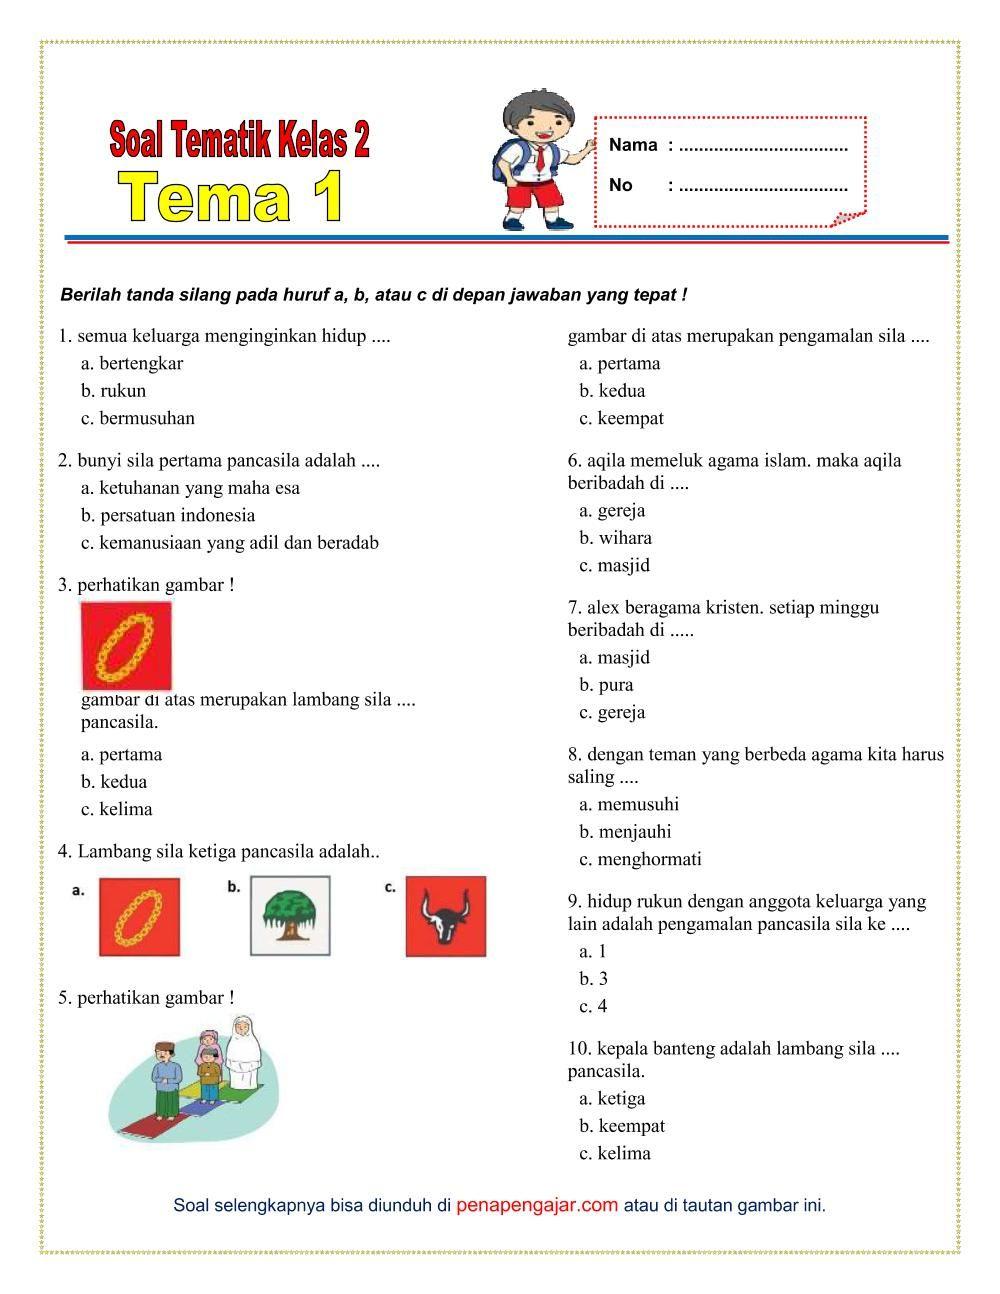 Soal Tema 1 Kelas 1 : kelas, Kelas, Semester, Kurikulum, Revisi, Matematika, Satu,, Belajar, Ejaan,, Sekolah, Dasar